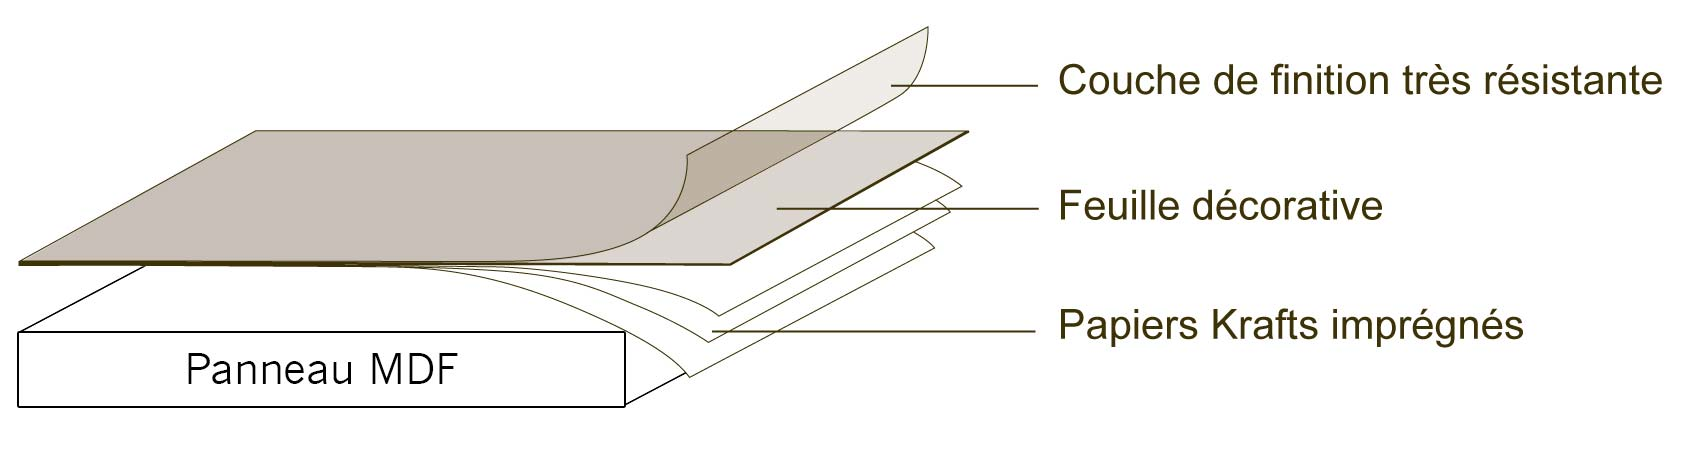 Panneau en stratifié pour fabrication de billard et billard table